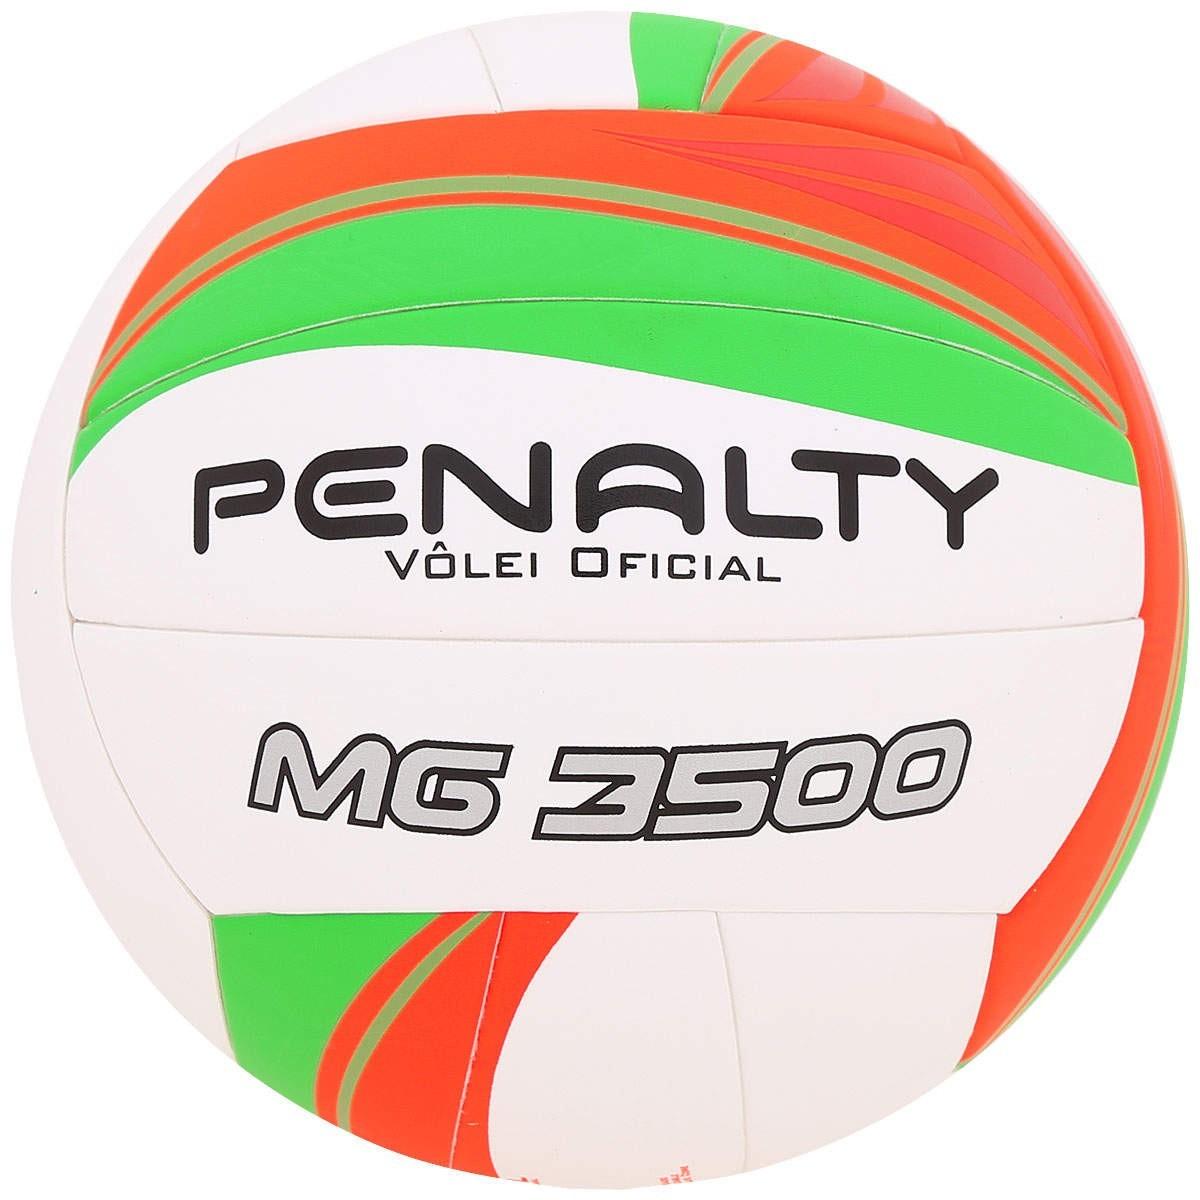 e1a3881b082fe Bola Vôlei Penalty MG 3500 V 520186 1790 - Branco Laranja Verde ...